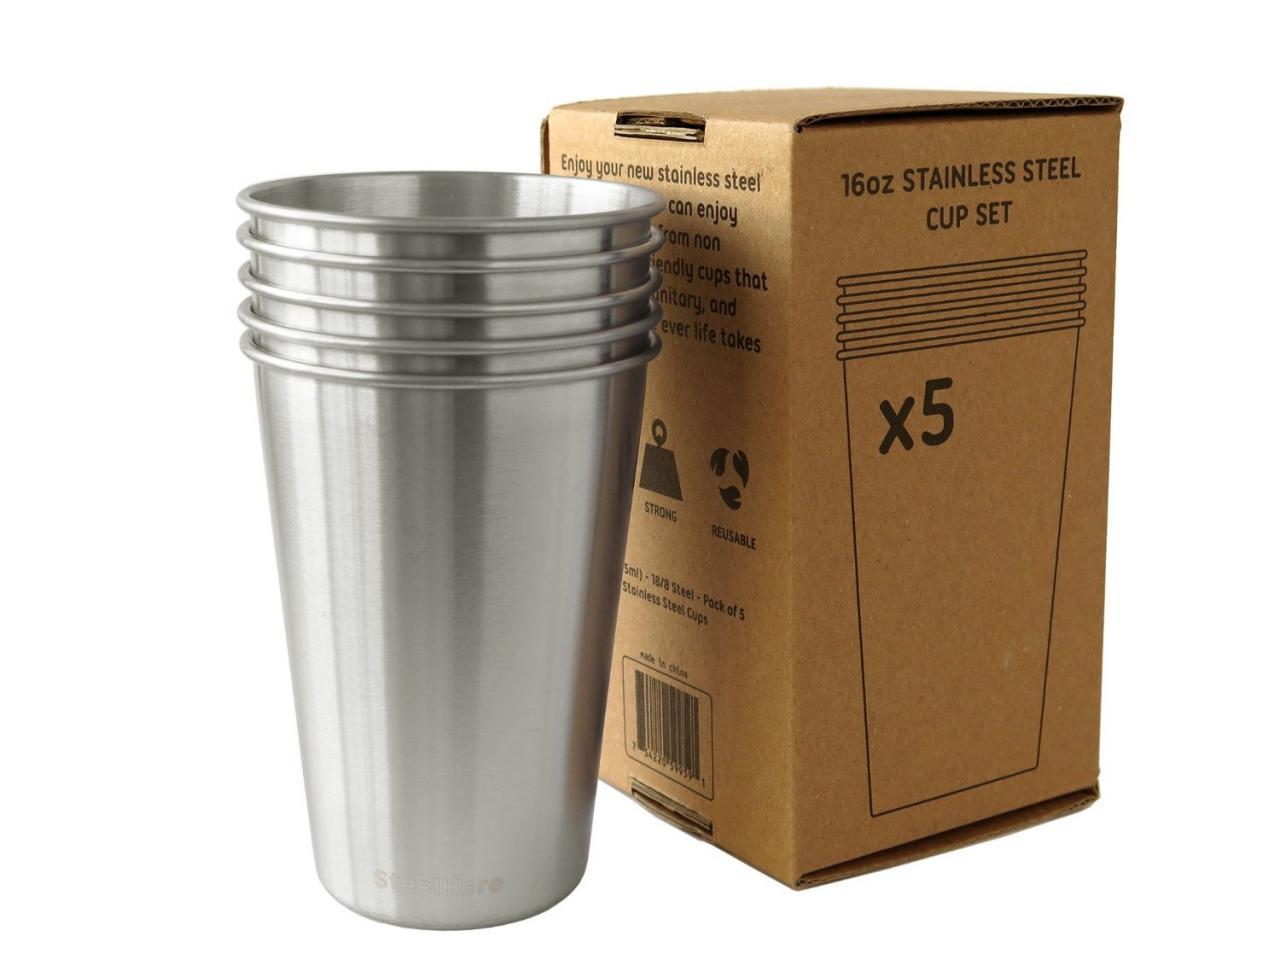 Amazon Mug 10 คีย์สินค้า ปี 2016 สินค้ากลุ่มนี้กำลังร้อนแรงอยู่ในช่วงเวลานี้! นักขาย Amazon จะรออะไรคลิกดูกันเลย :)